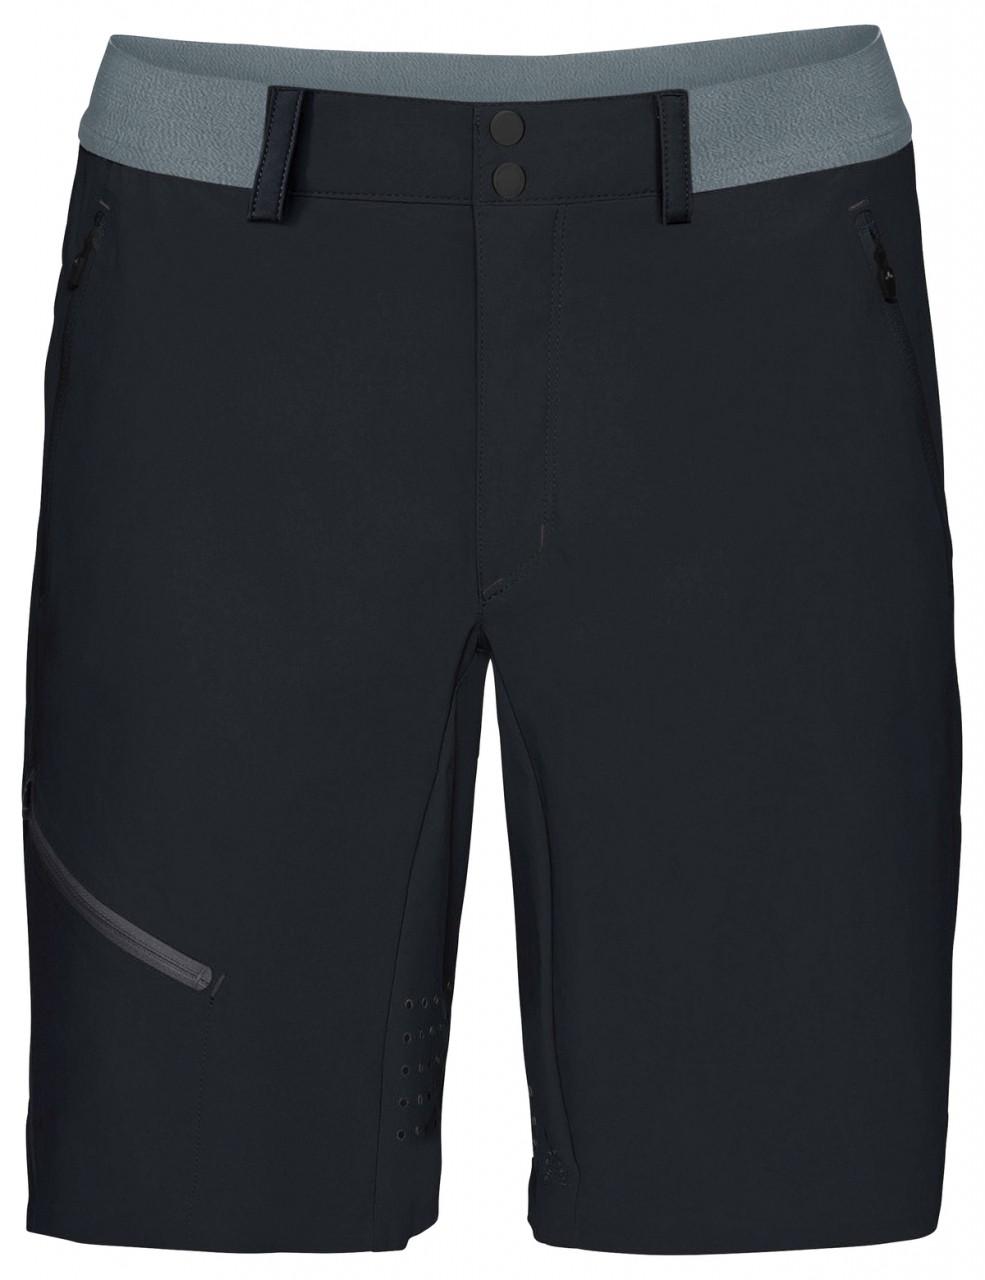 Vaude Scopi LW Shorts II - Short randonnée homme